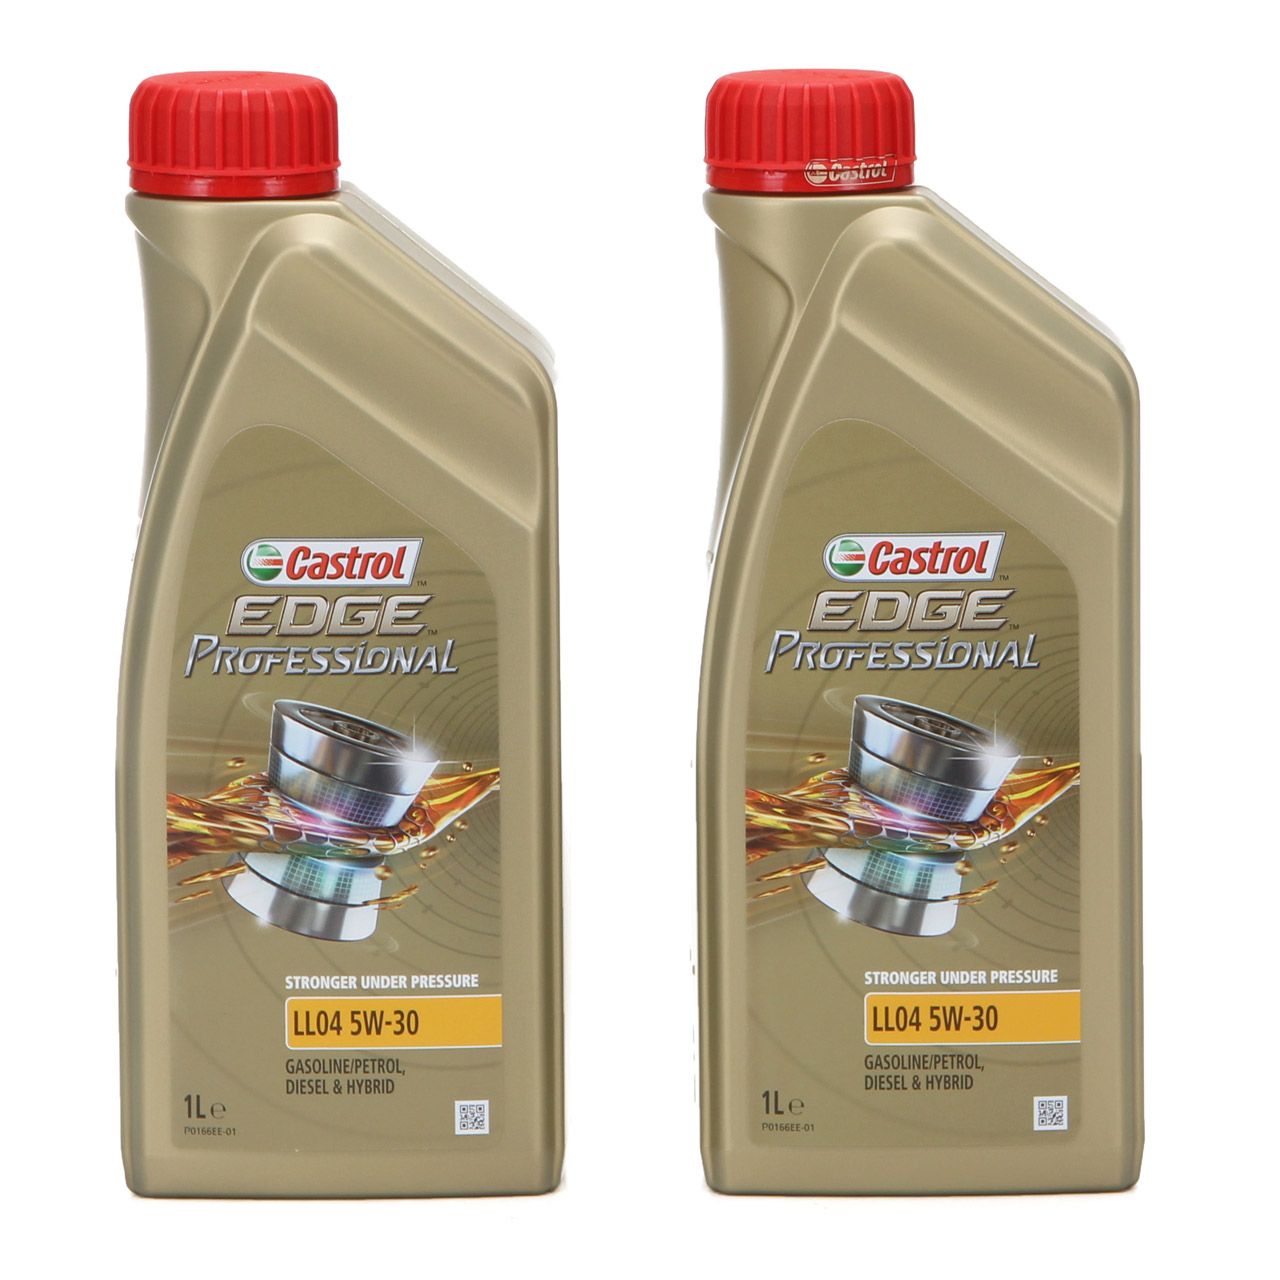 CASTROL EDGE Professional Motoröl Öl für BMW Longlife IV LL04 5W-30 - 2 Liter